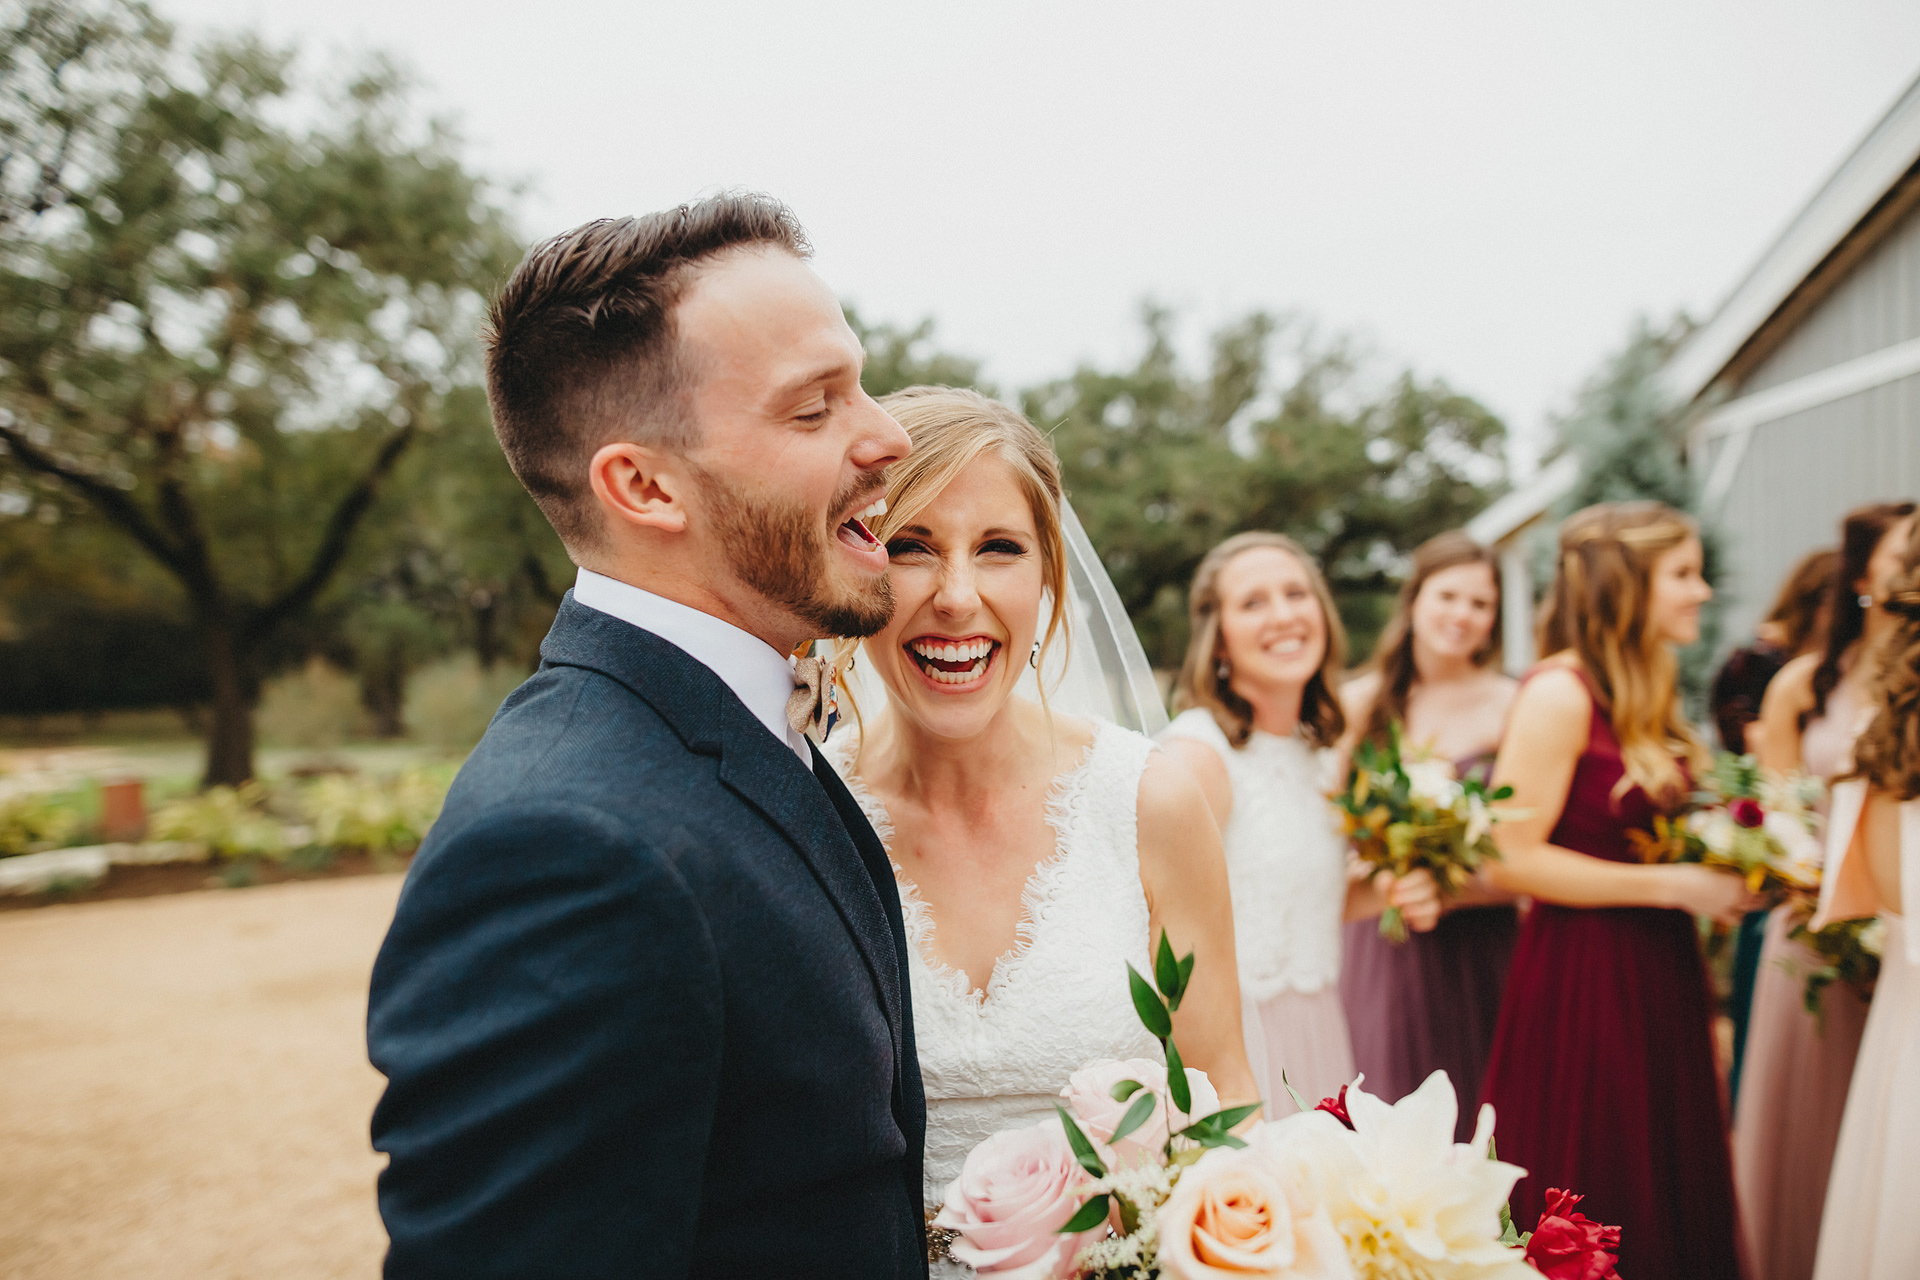 travis-hallmark-sarah-the-addison-grove-austin-wedding-photographers-00226.jpg